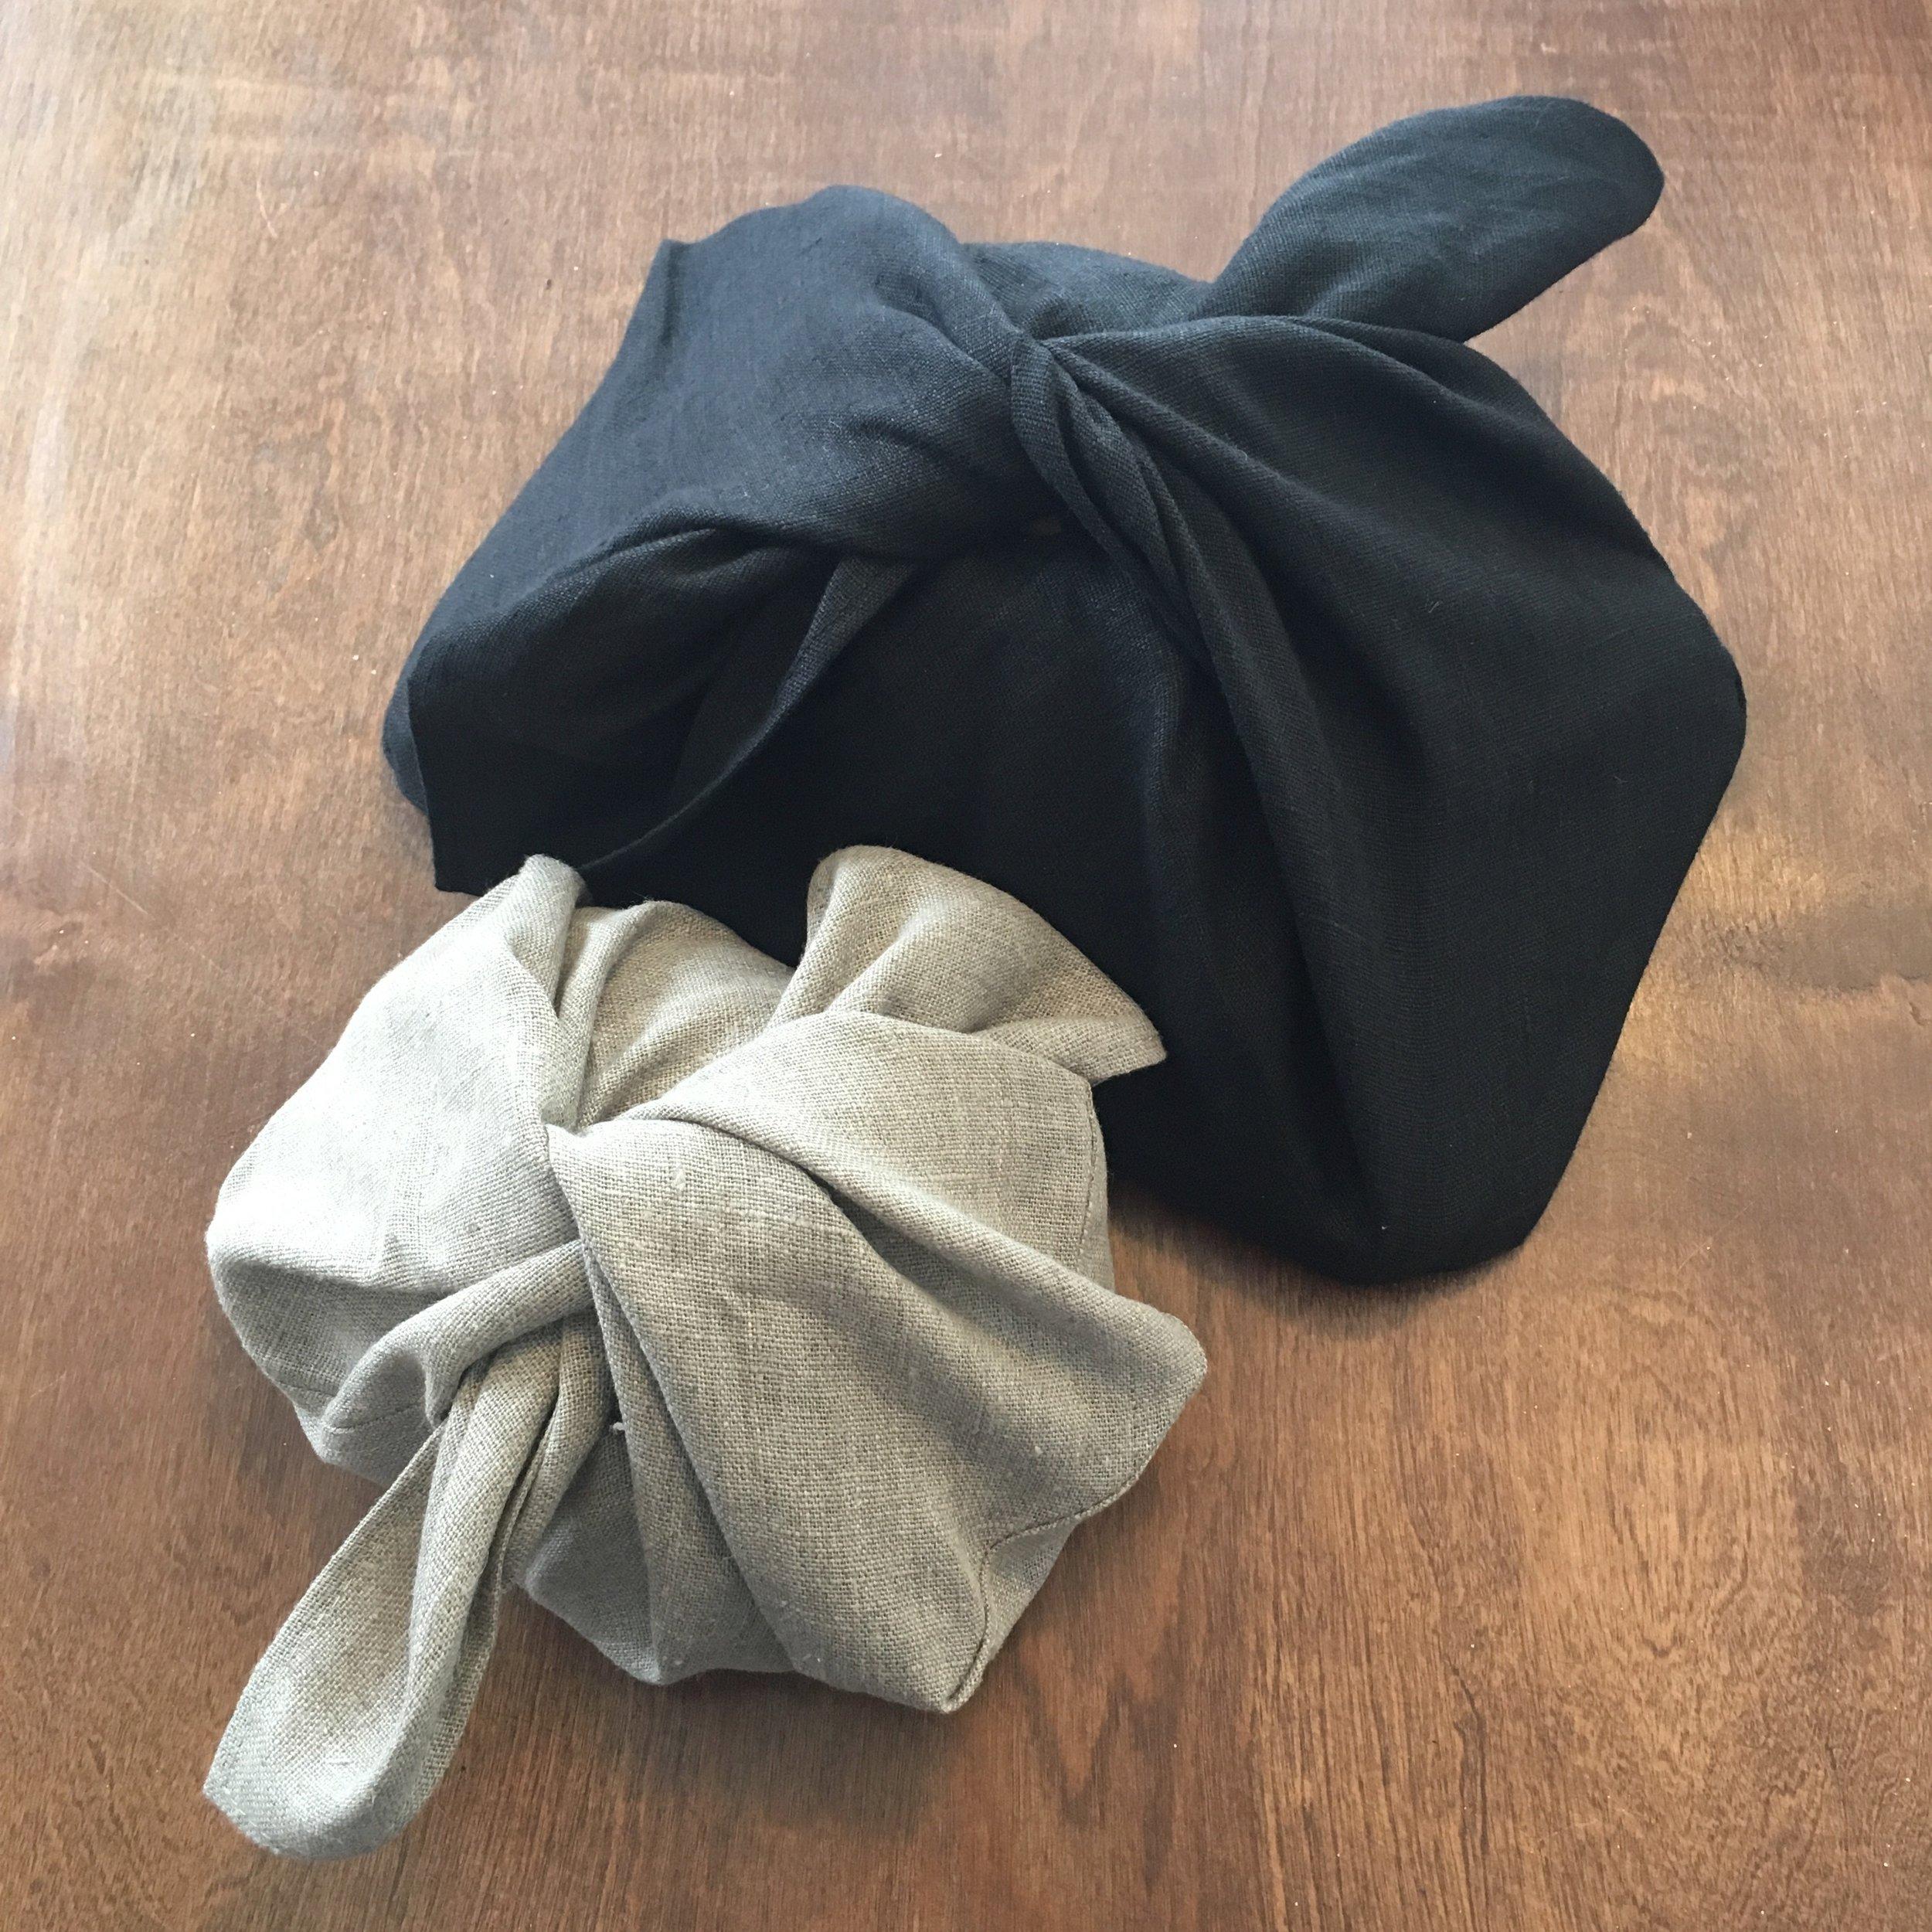 black and grey tied.jpg